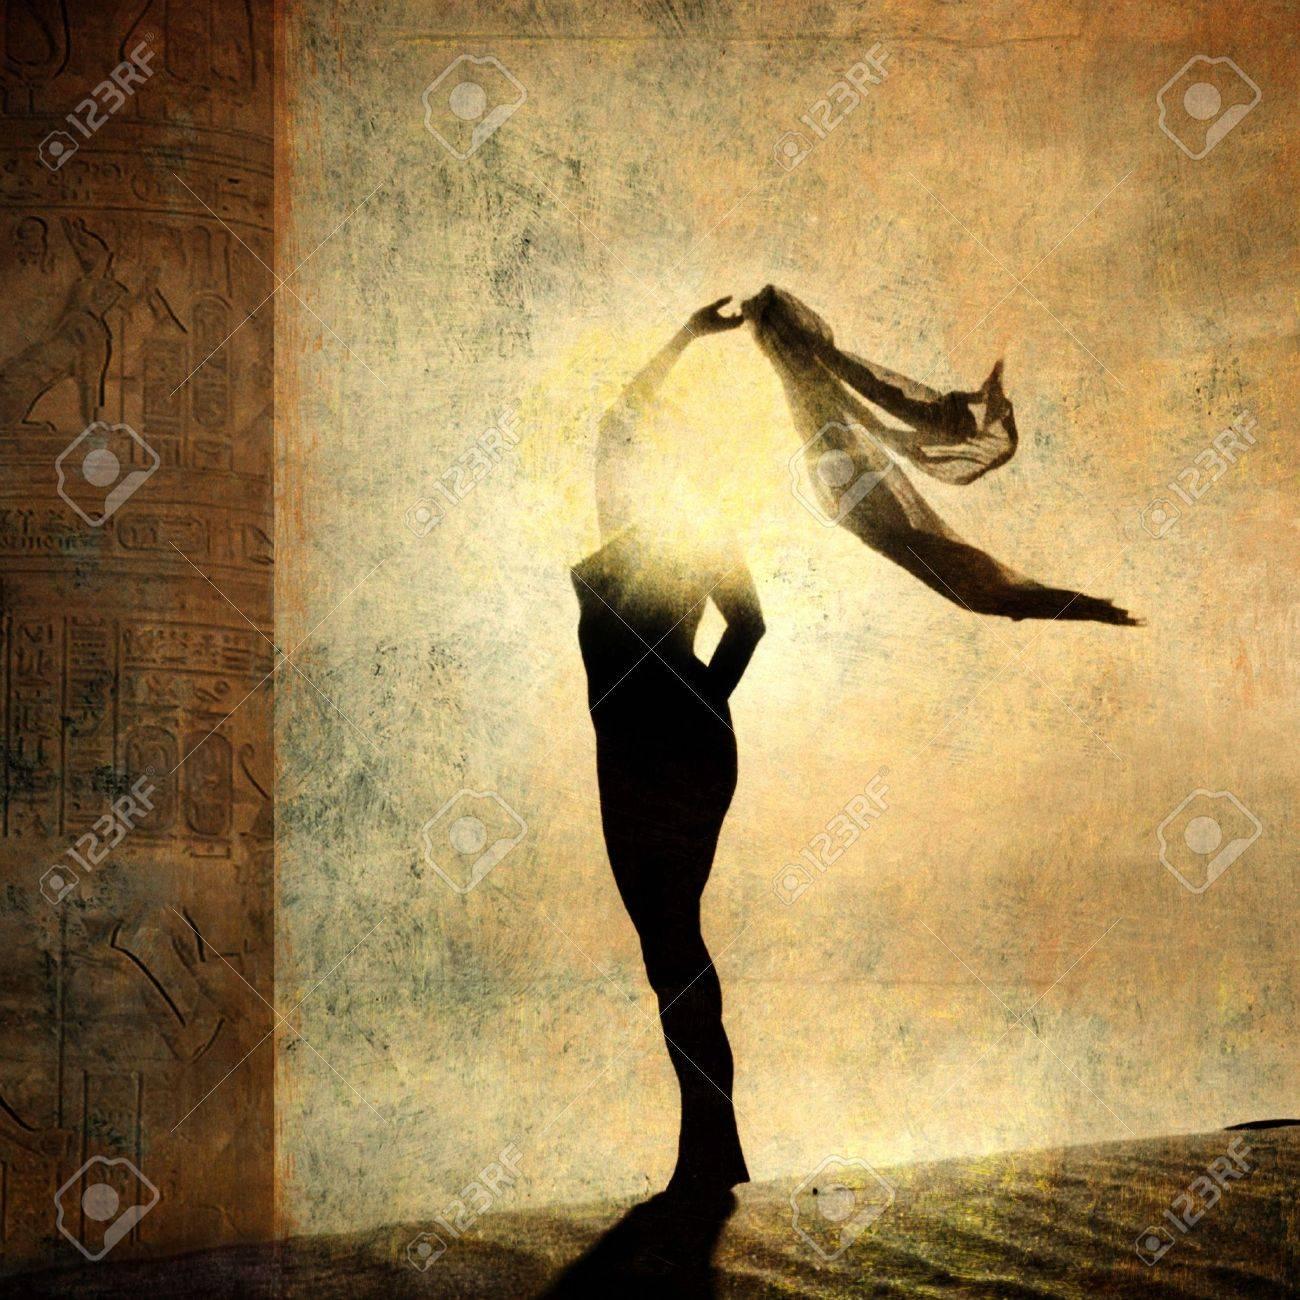 Silhouette of an illuminated woman. Photo based illustration. - 5161198